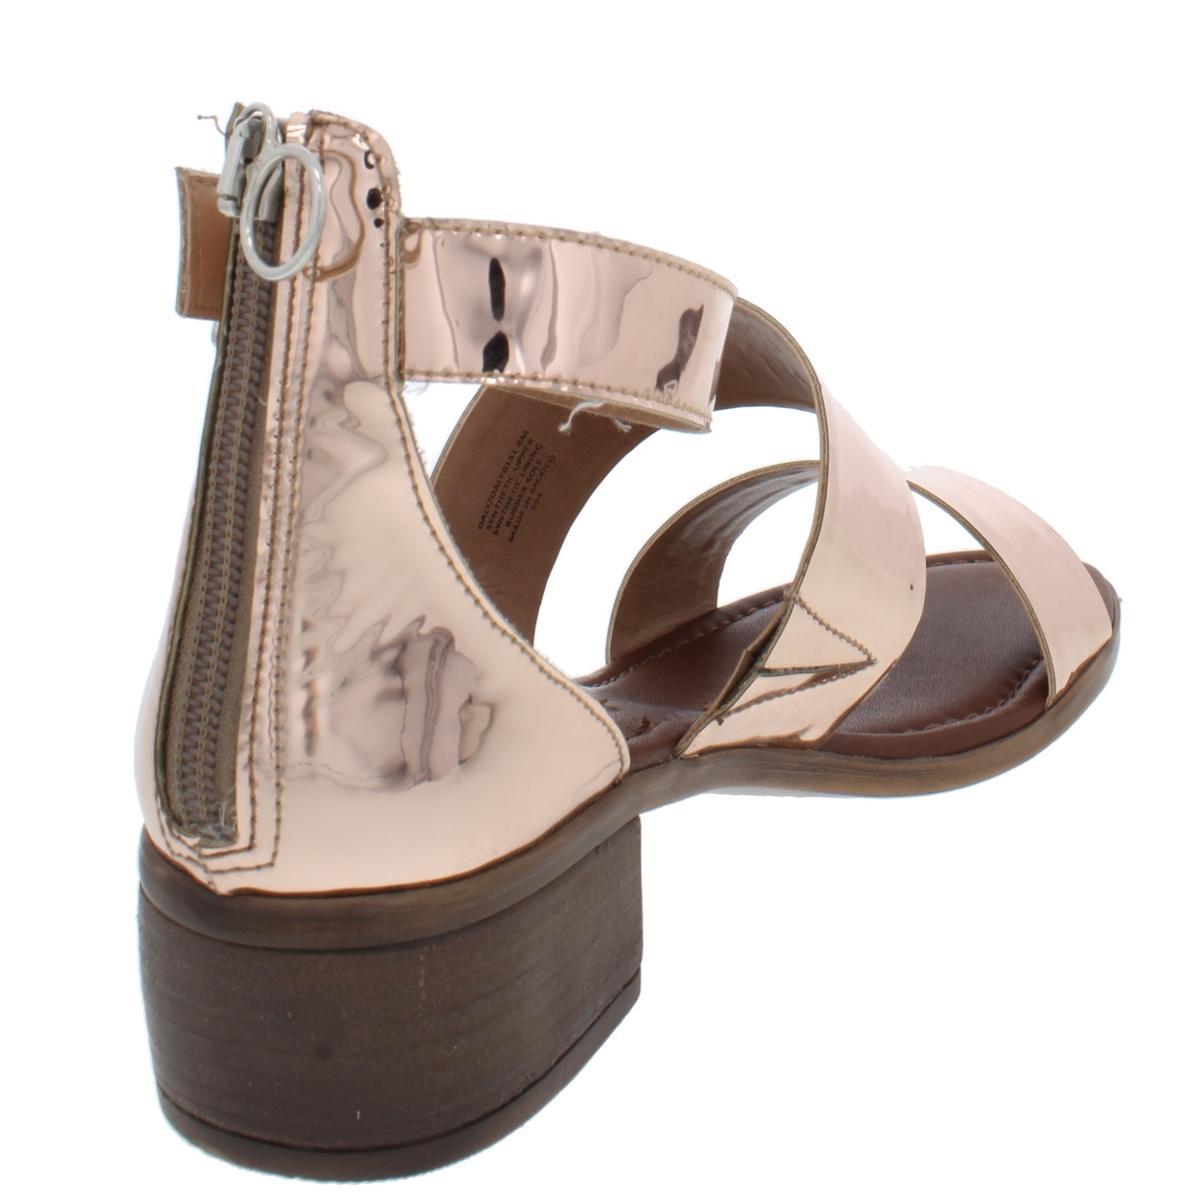 Steve-Madden-Womens-Daly-Leather-Open-Toe-Dress-Heels-Sandals-BHFO-5458 thumbnail 10